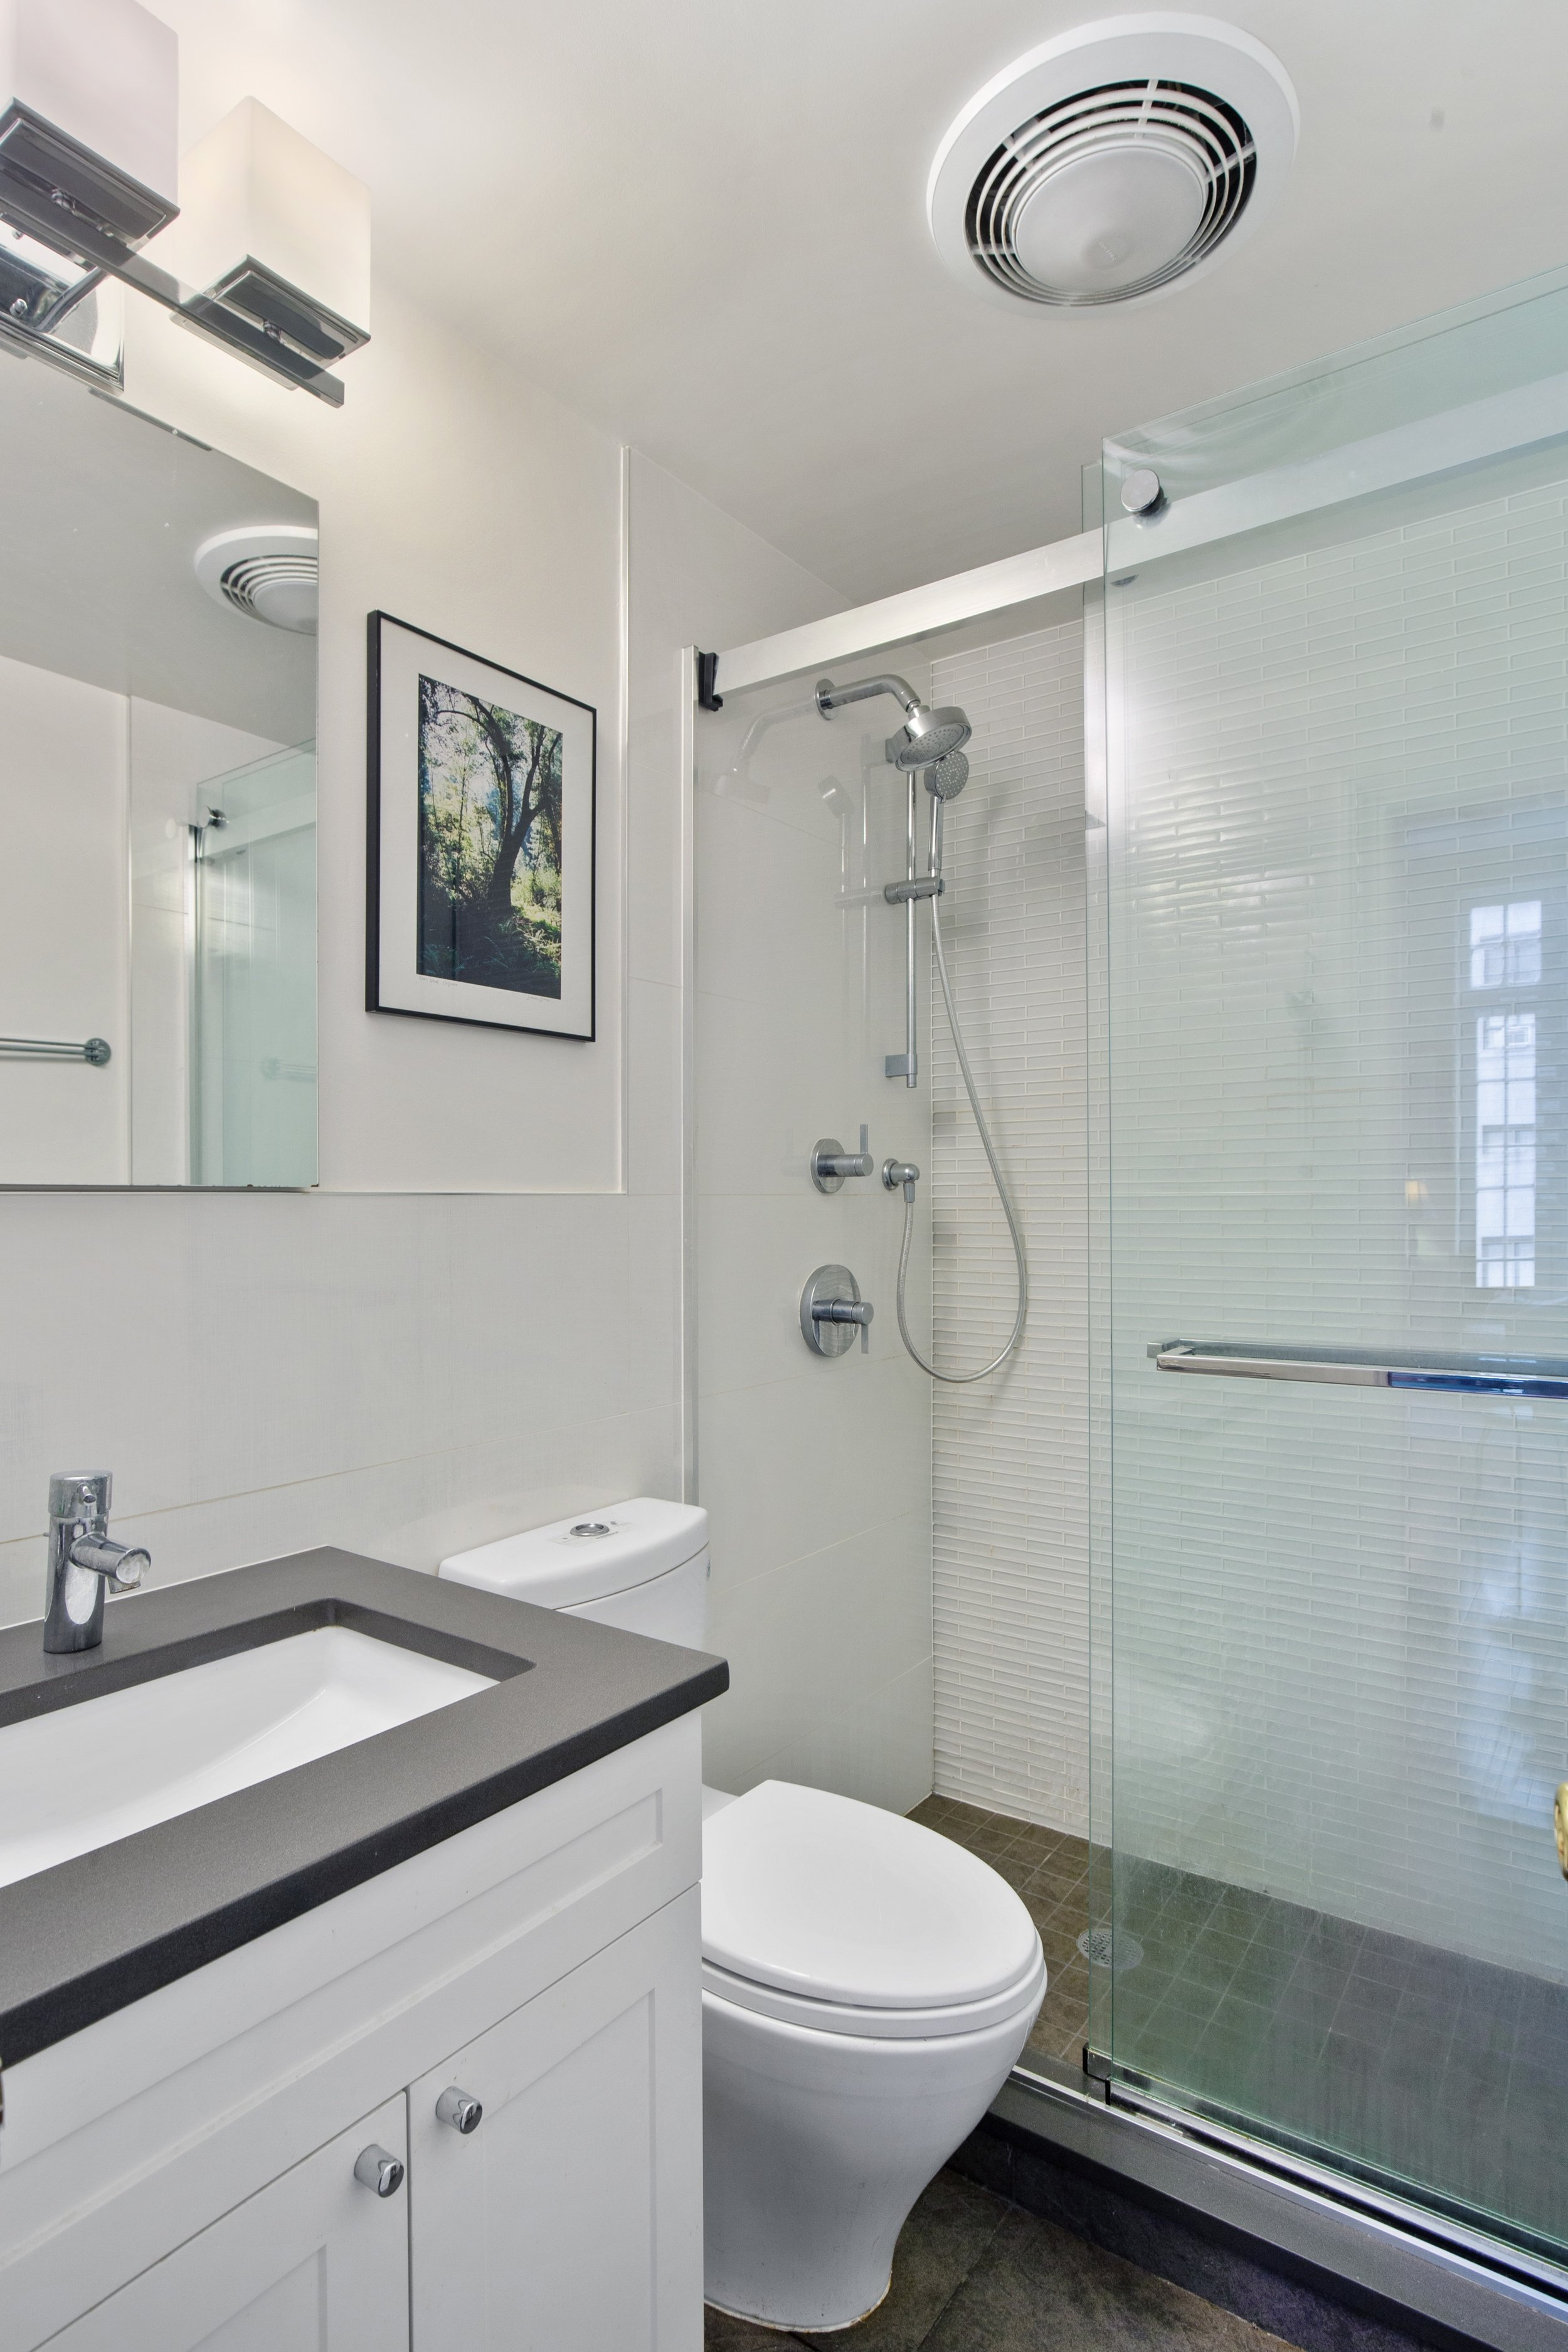 6_177ColumbiaHeights_Apt14_8_Bathroom_HiRes.jpg